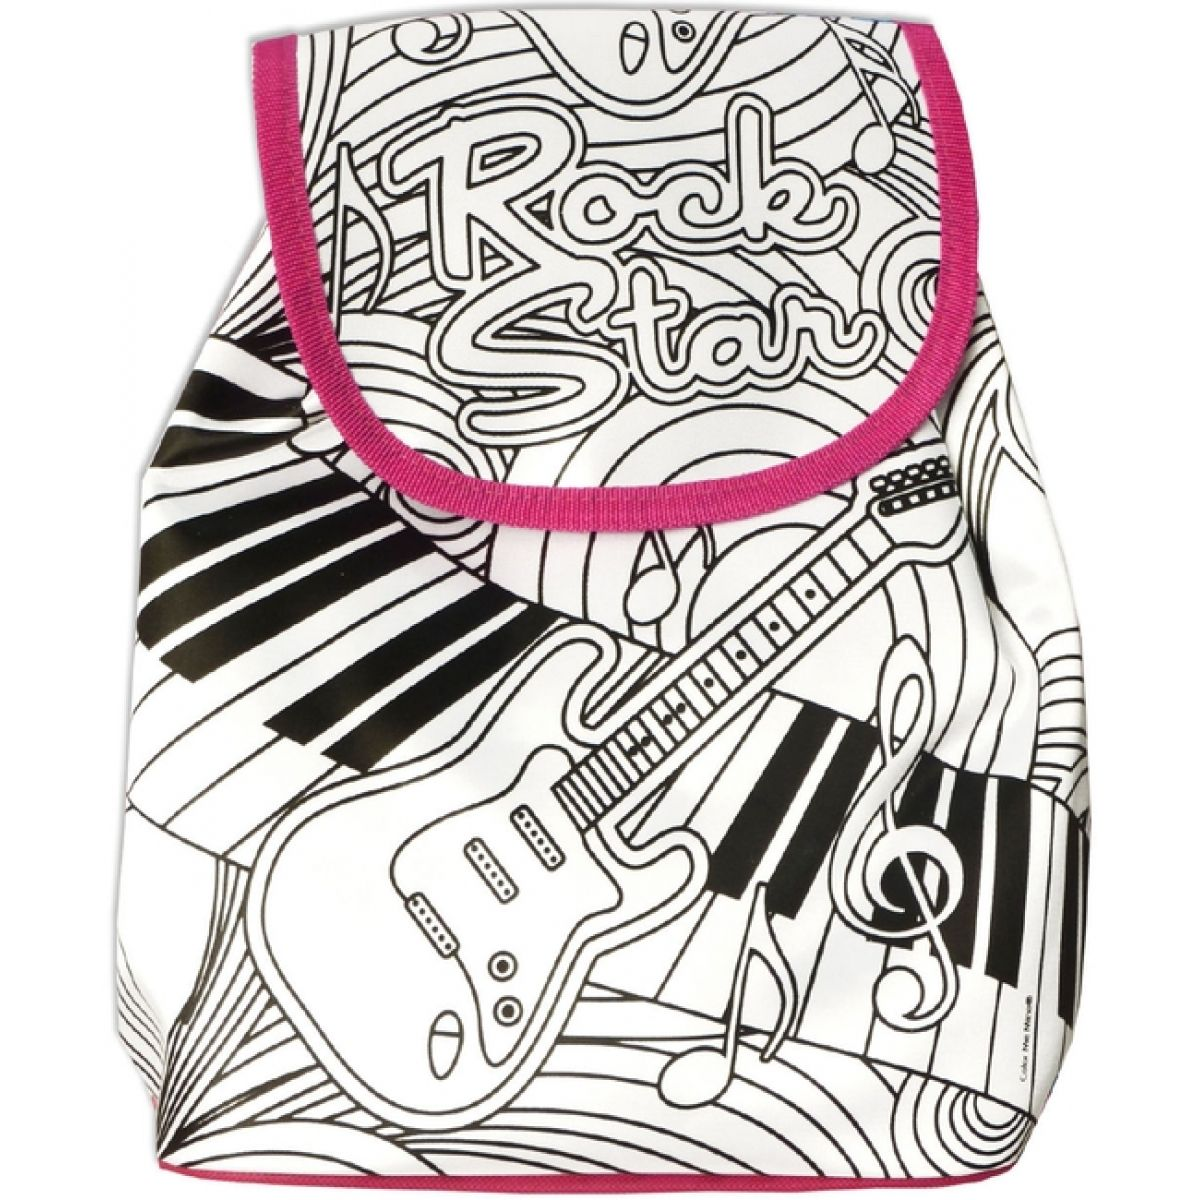 Color Me Mine batůžek Rock Star